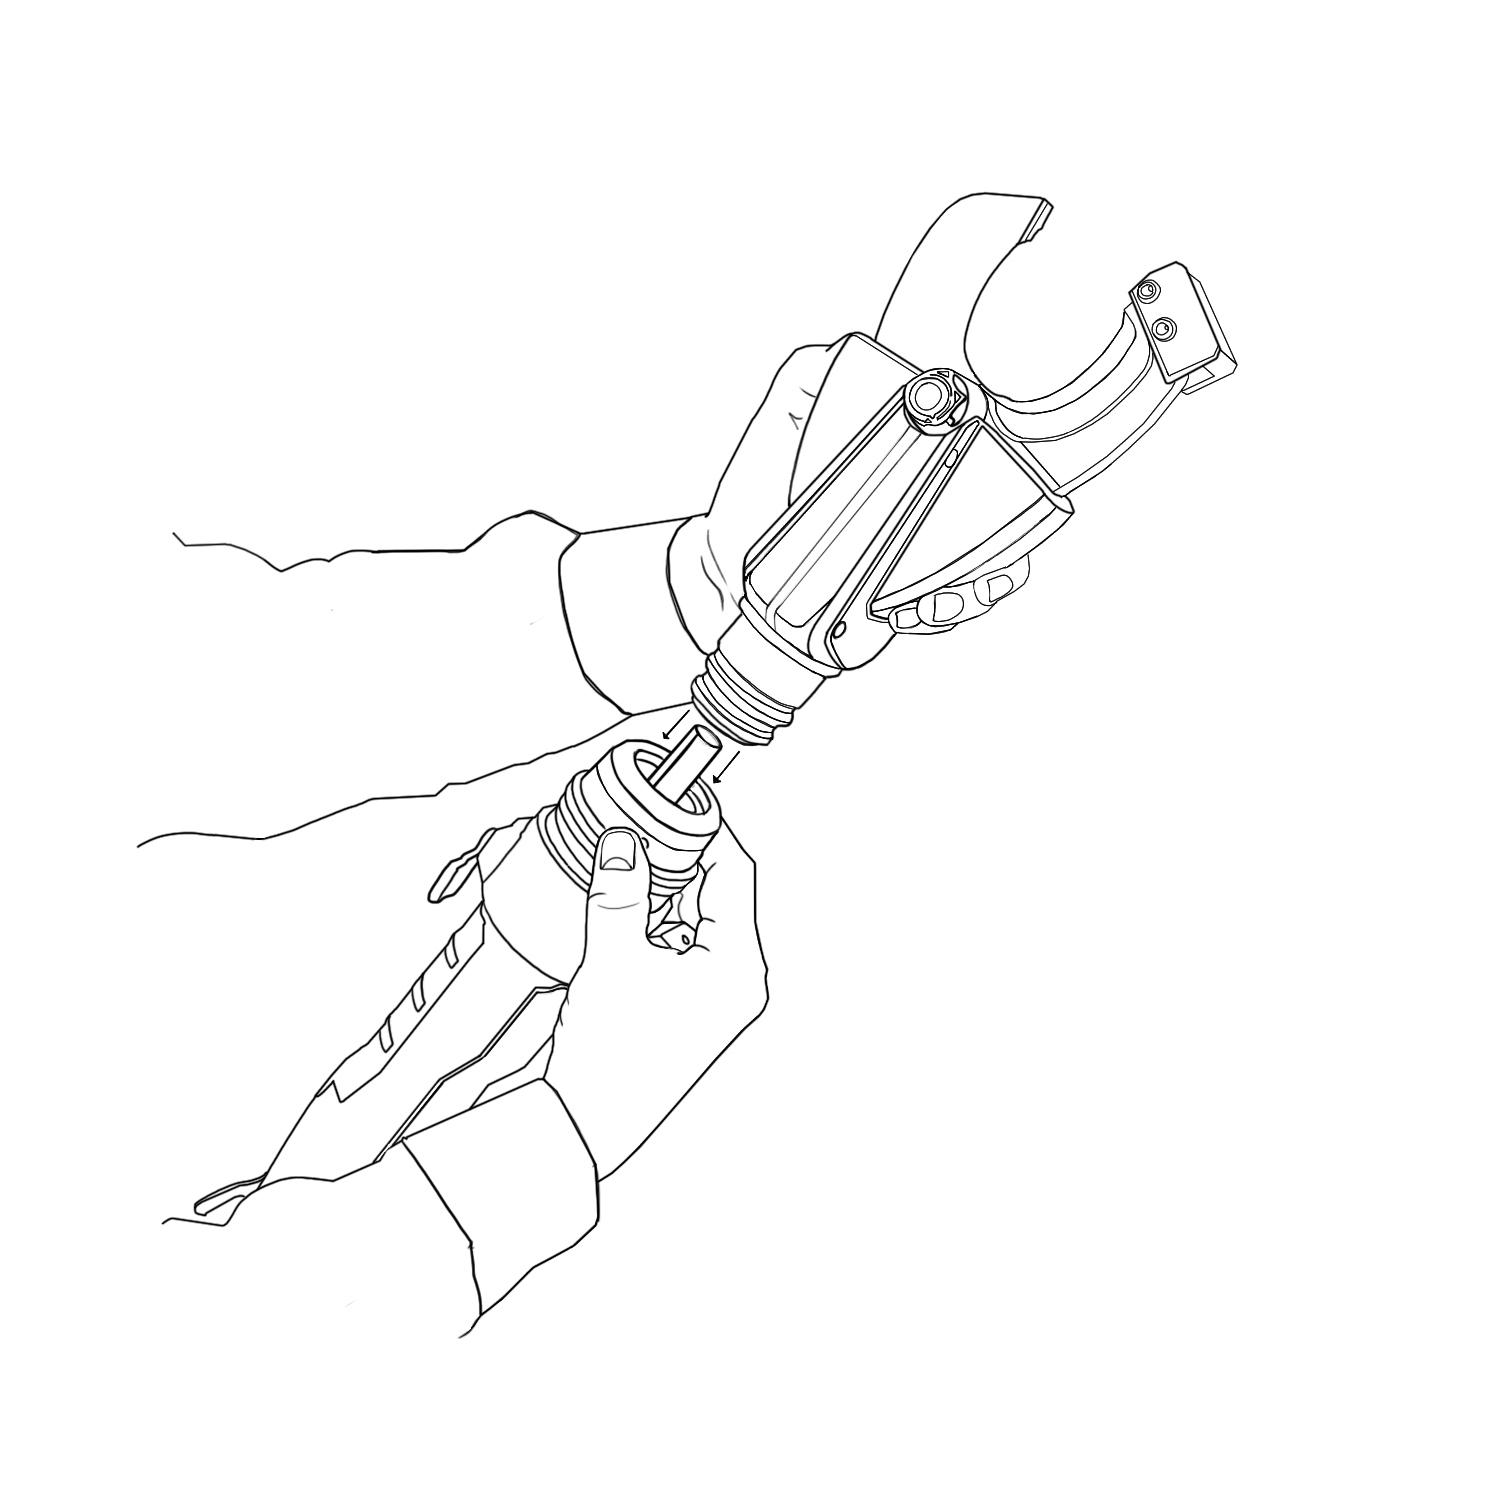 4268-01-Electrical QCS Illustrations_5x5_2.jpg